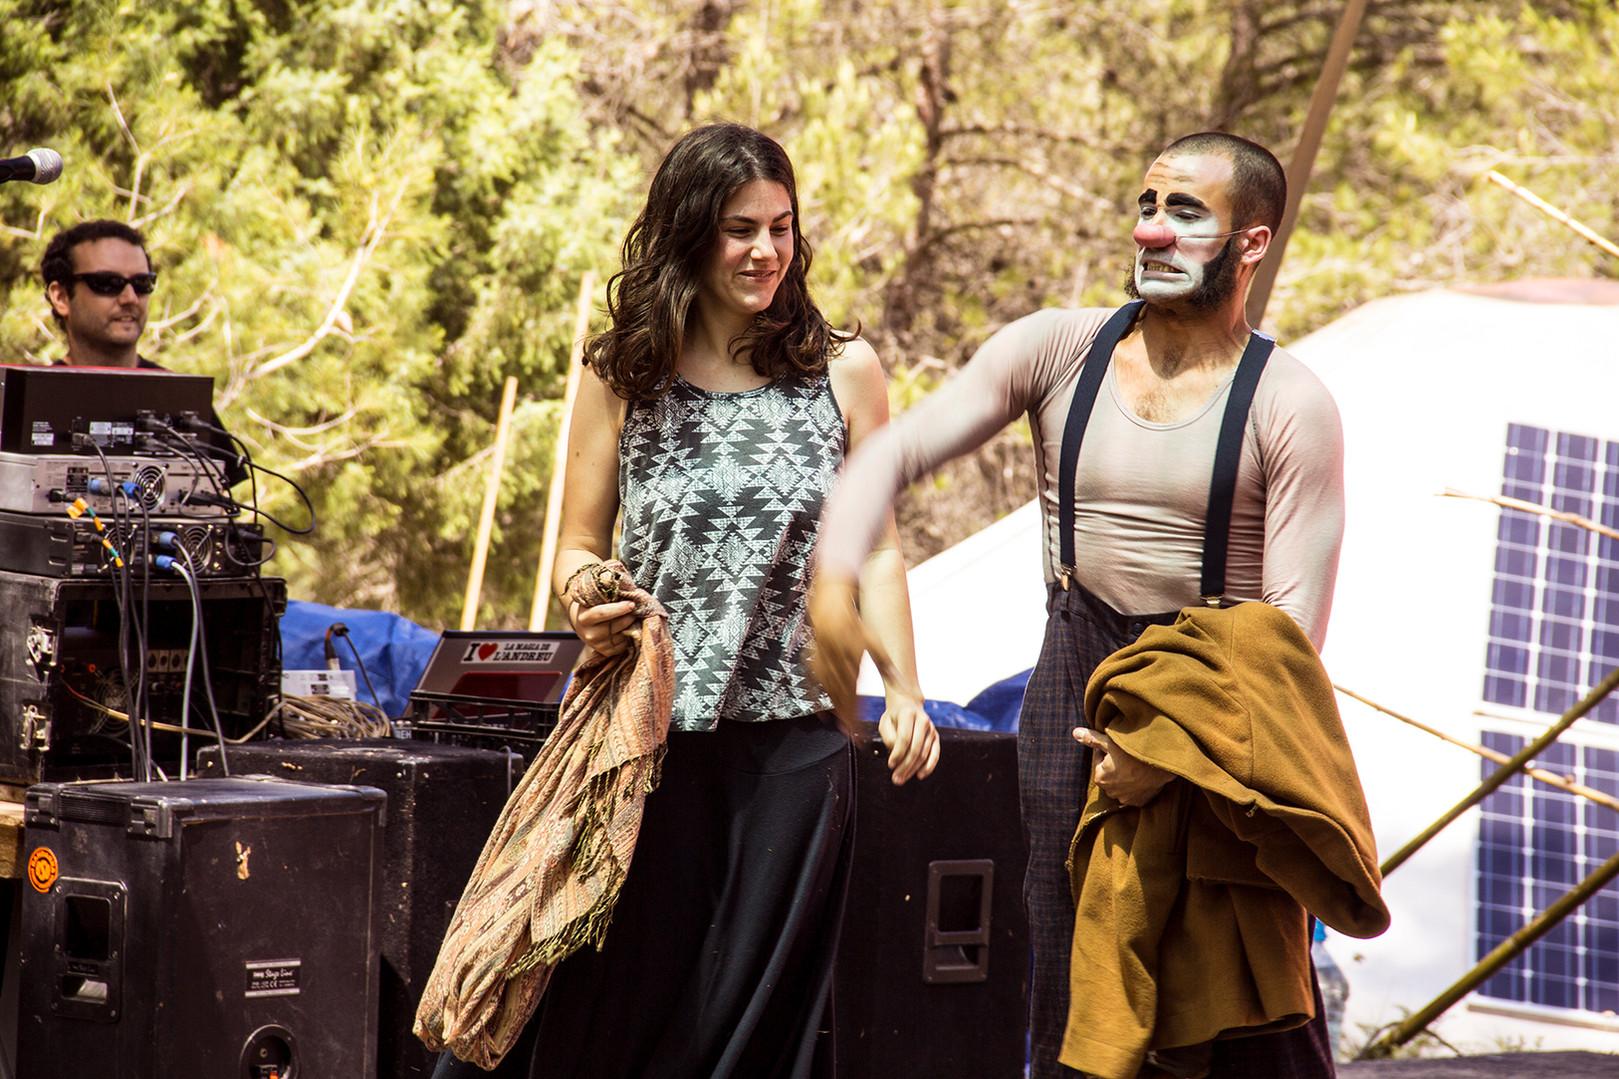 Festival Somiabarrets 2016